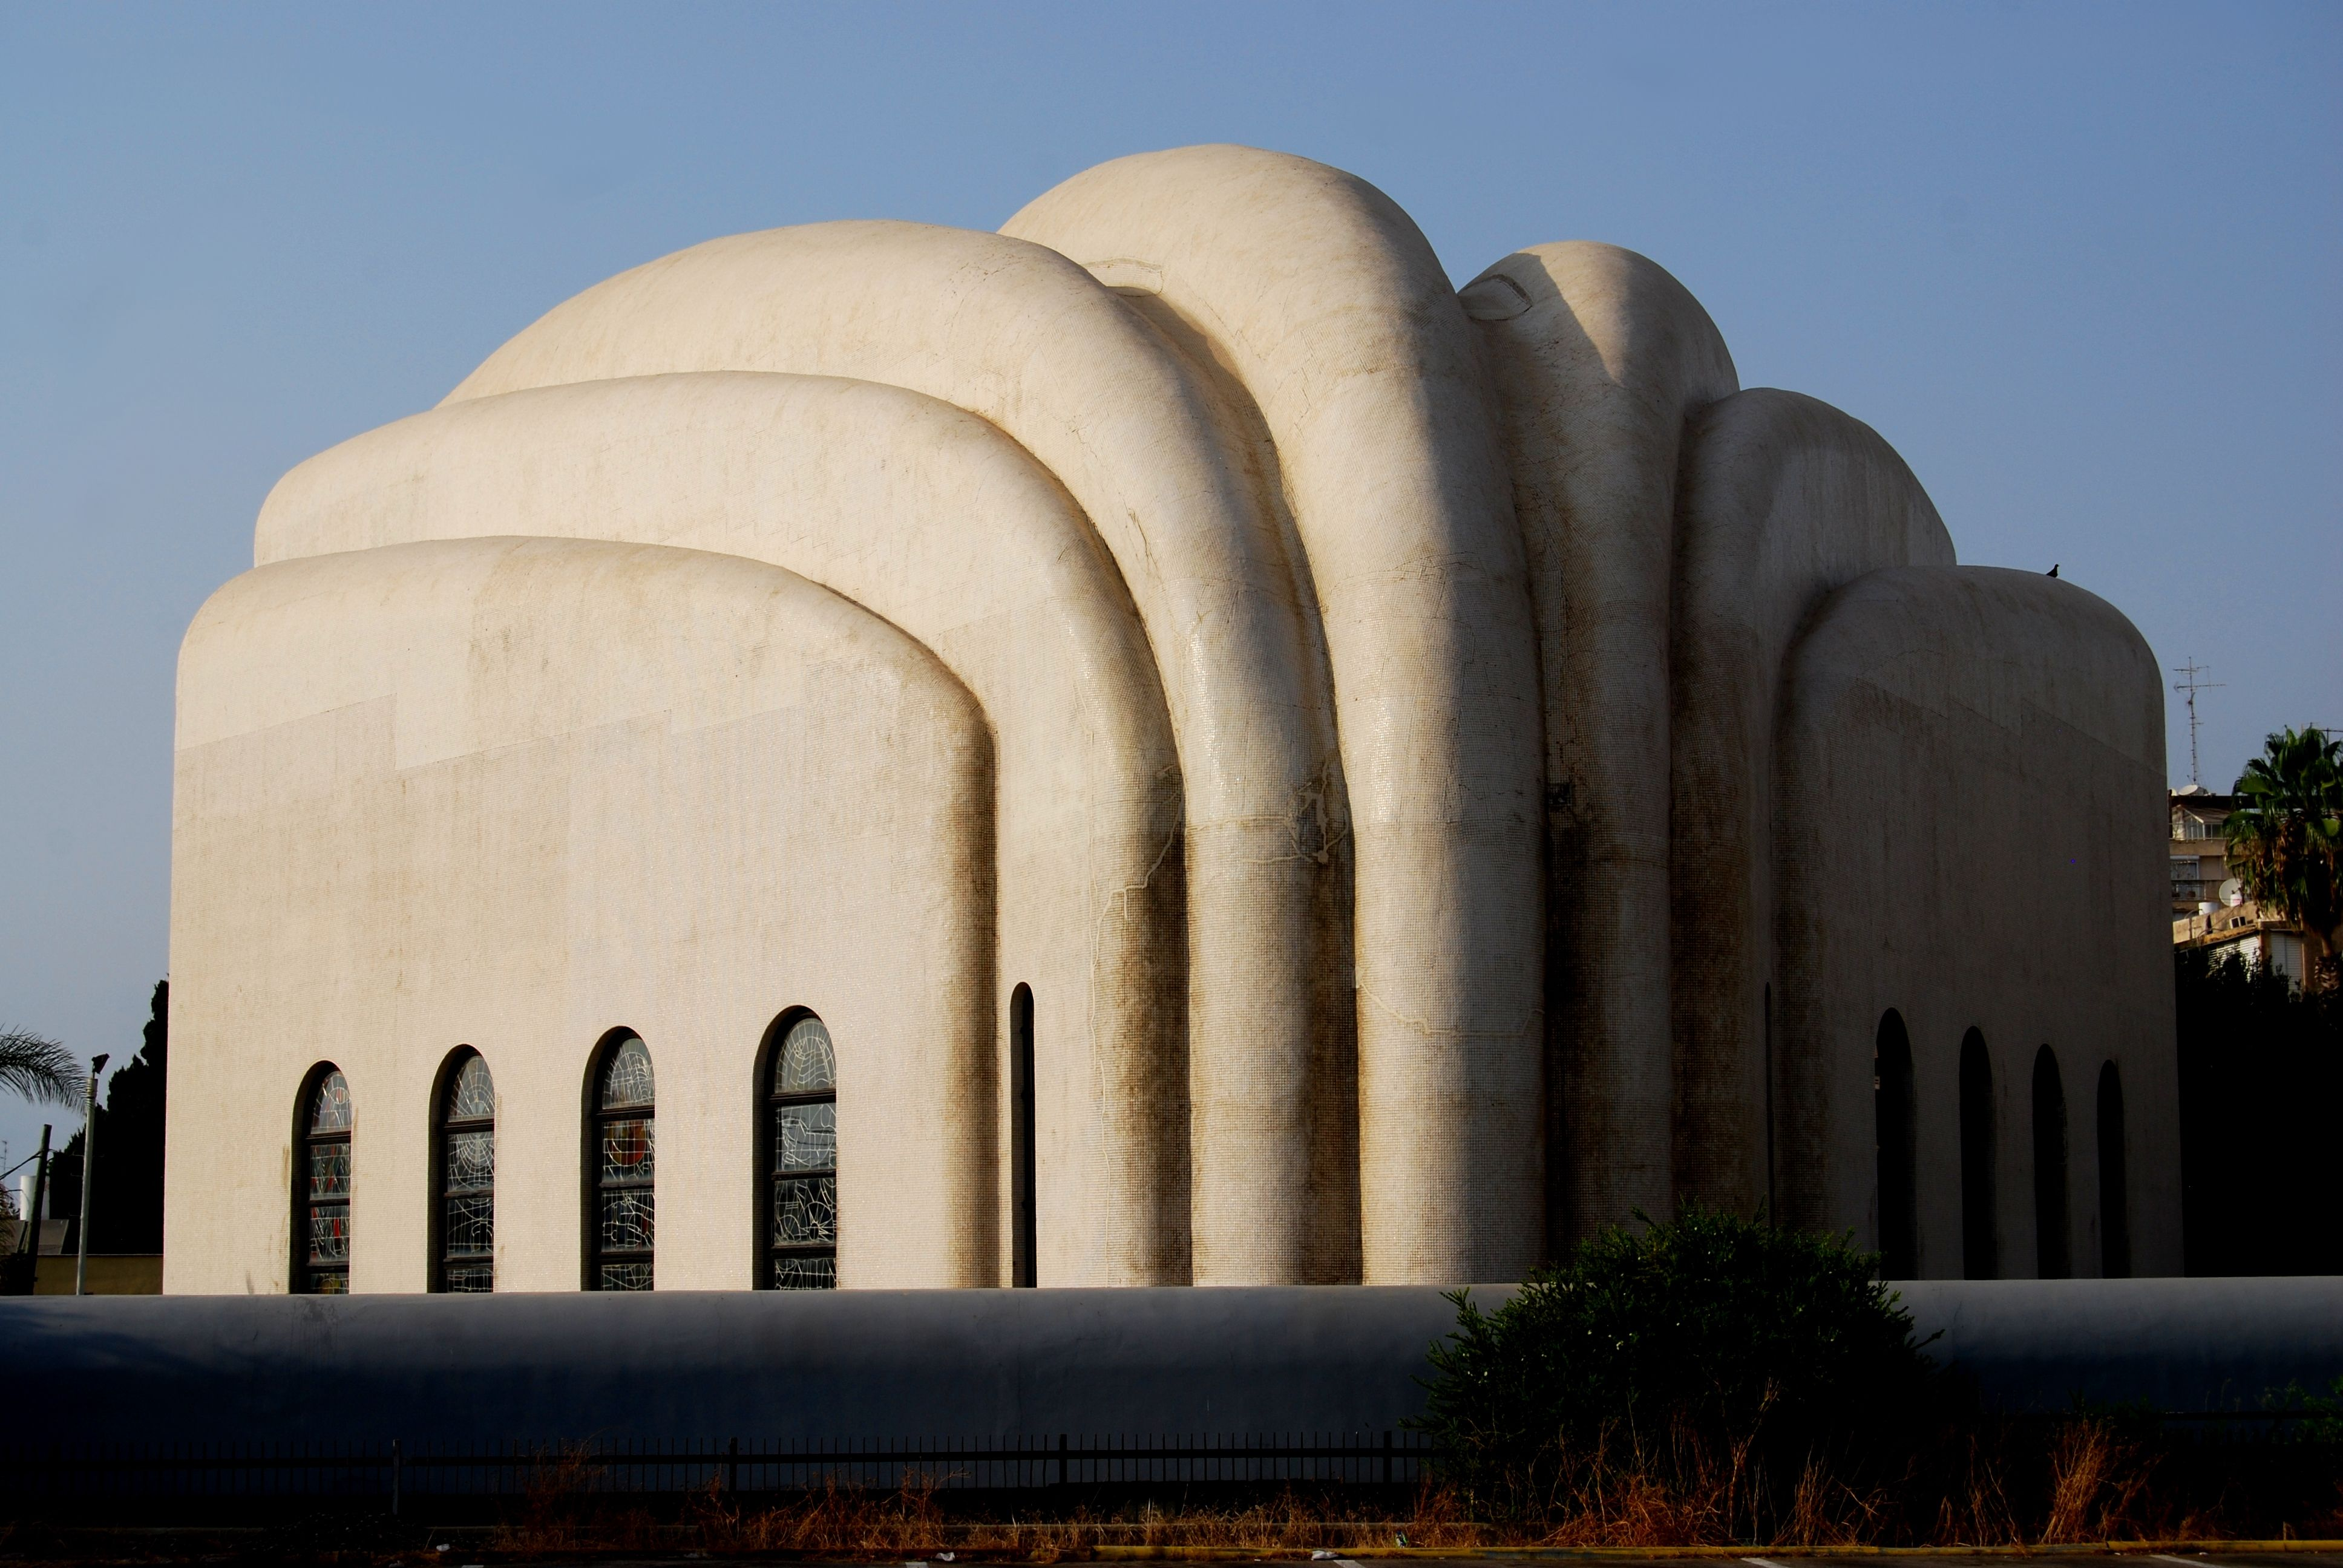 Hechal Yehuda Synagogue, Tel Aviv by Itzhak Toledano (1979)